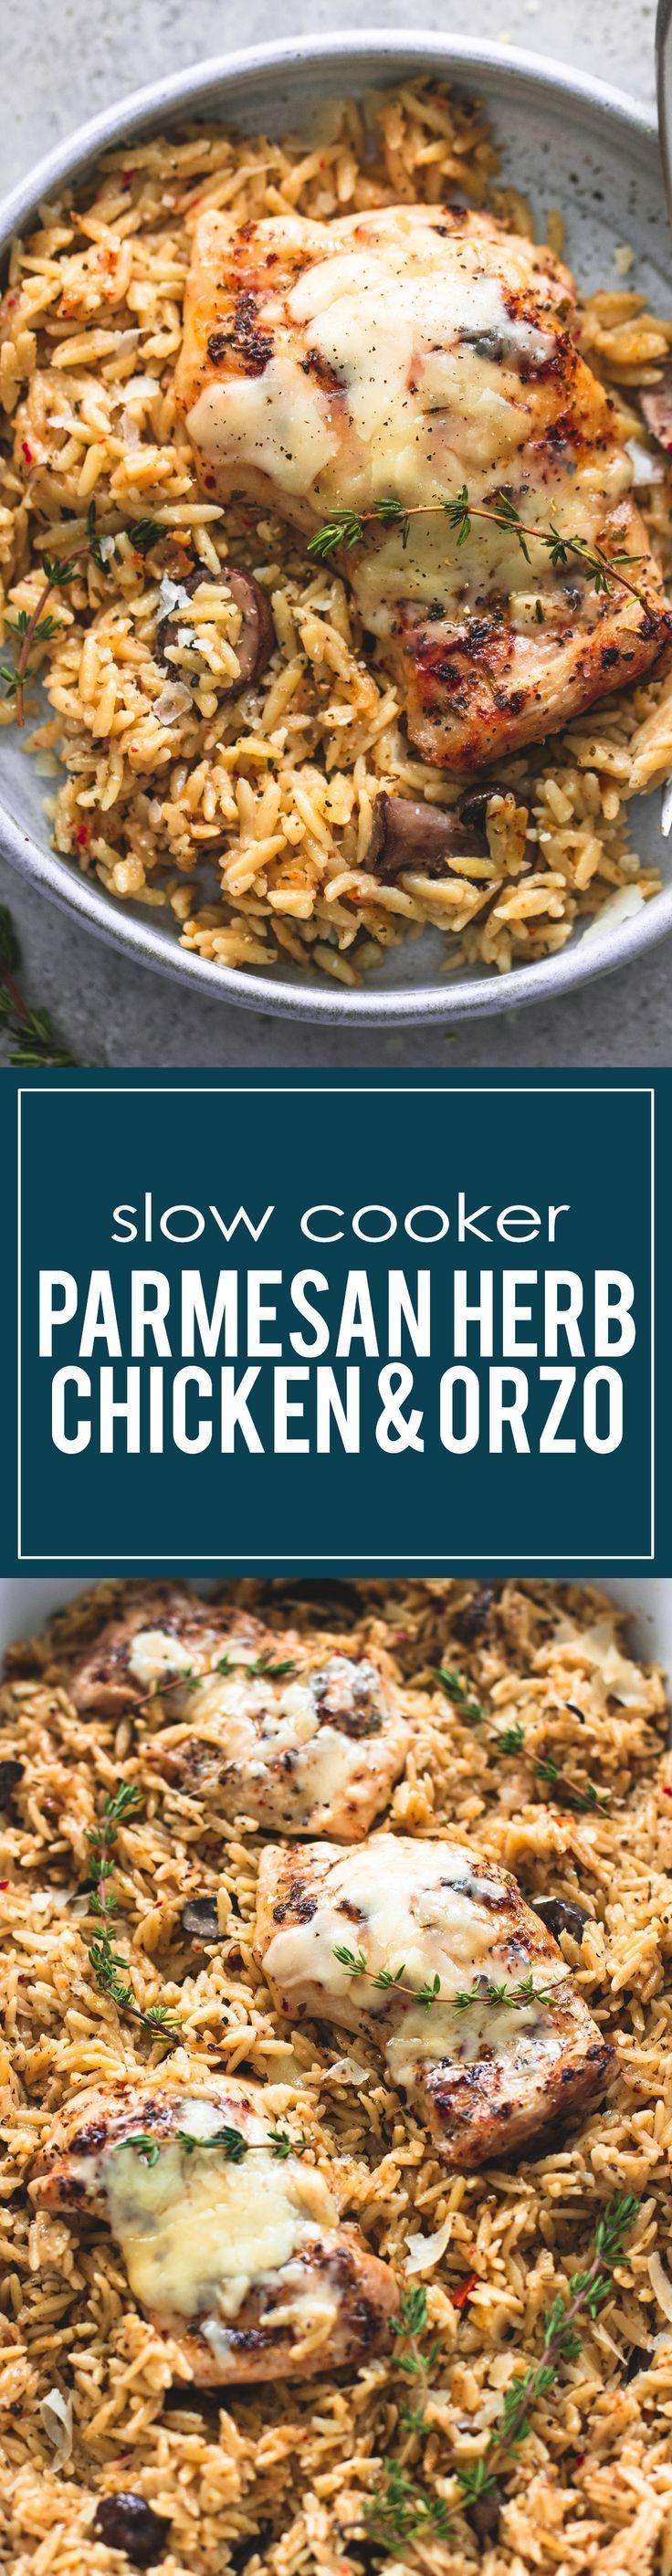 Easy Slow Cooker Parmesan Herb Chicken & Orzo   http://lecremedelacrumb.com